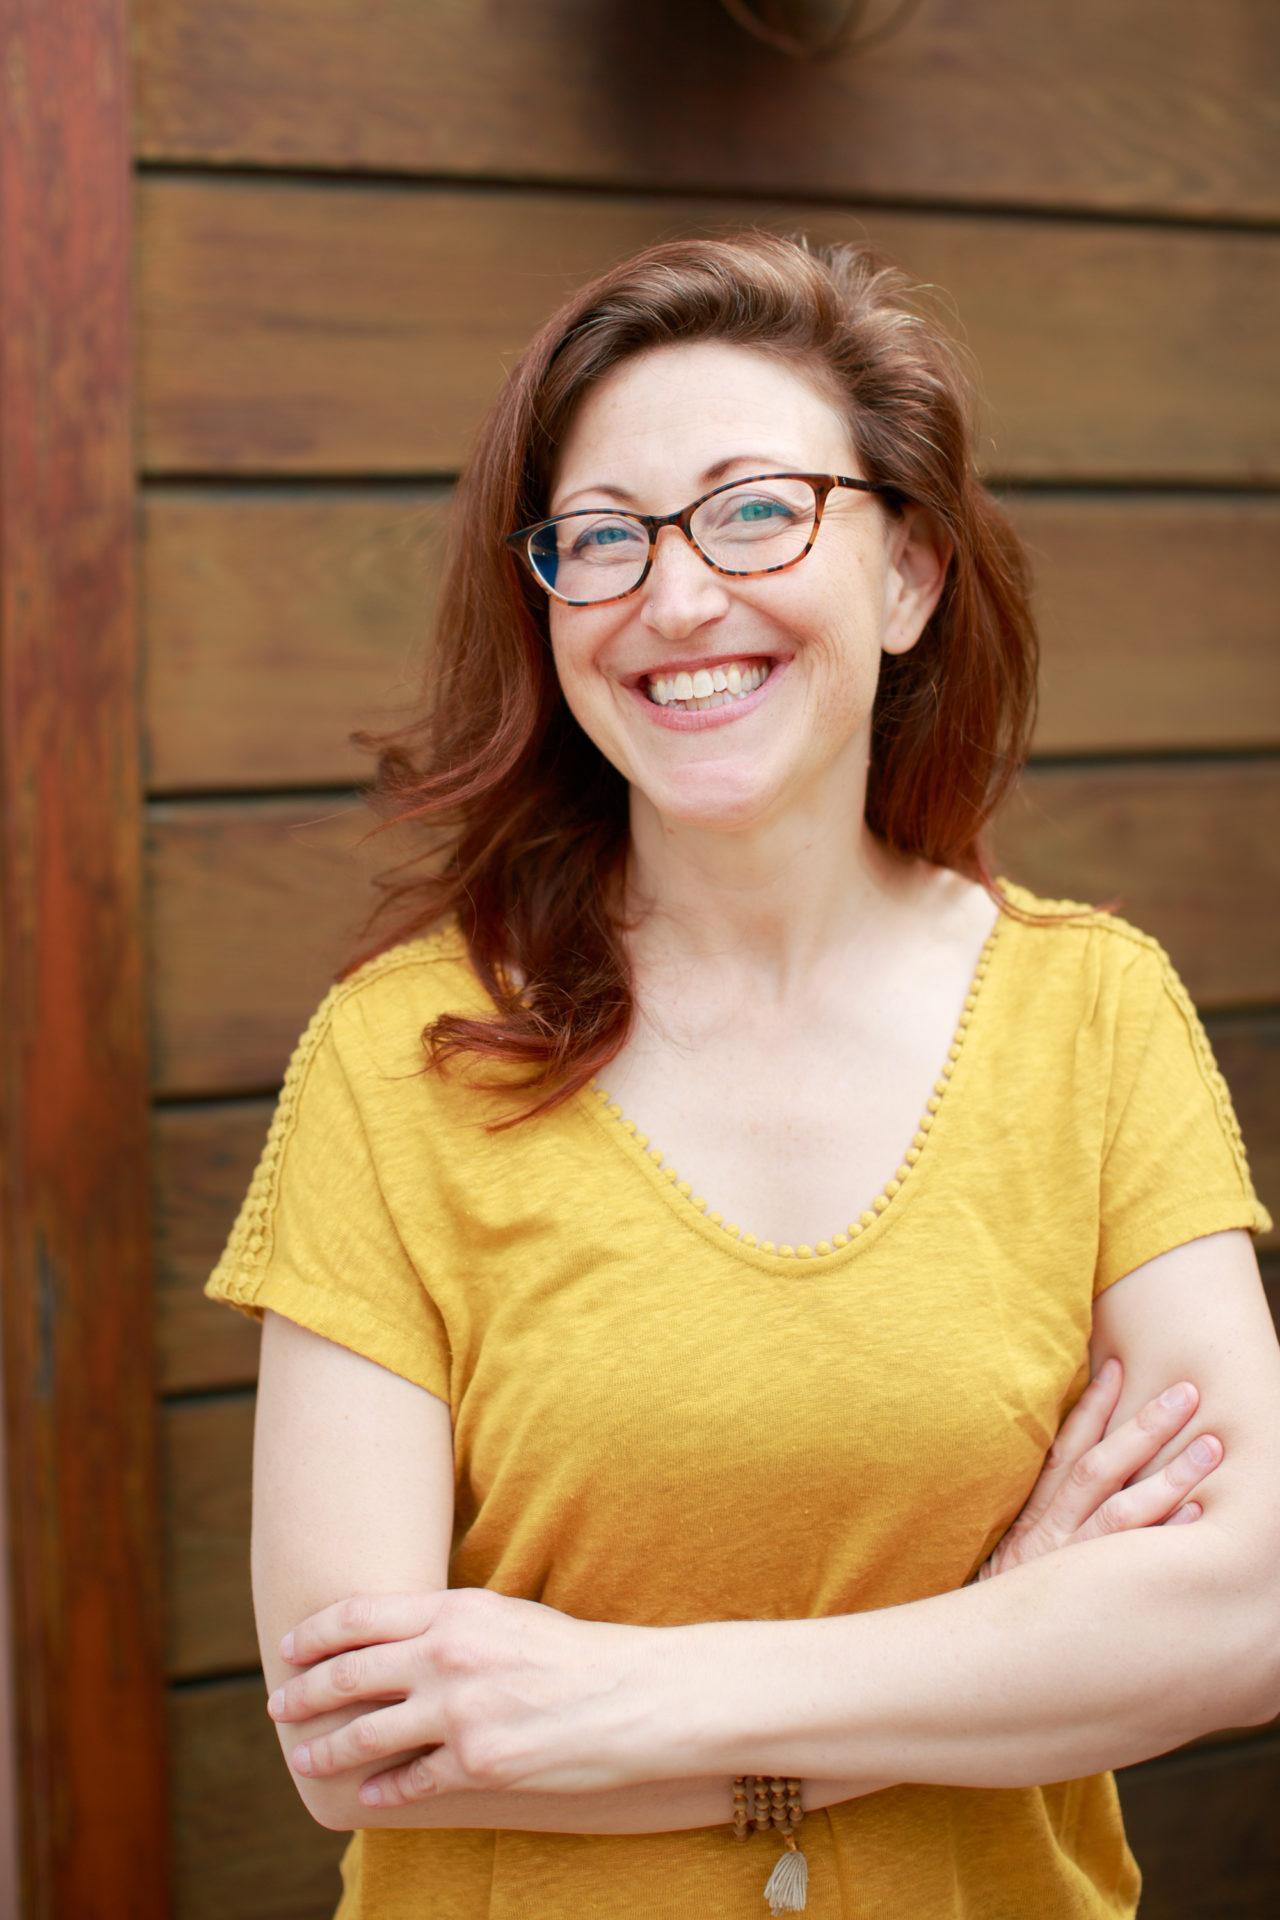 Kate Sadowsky